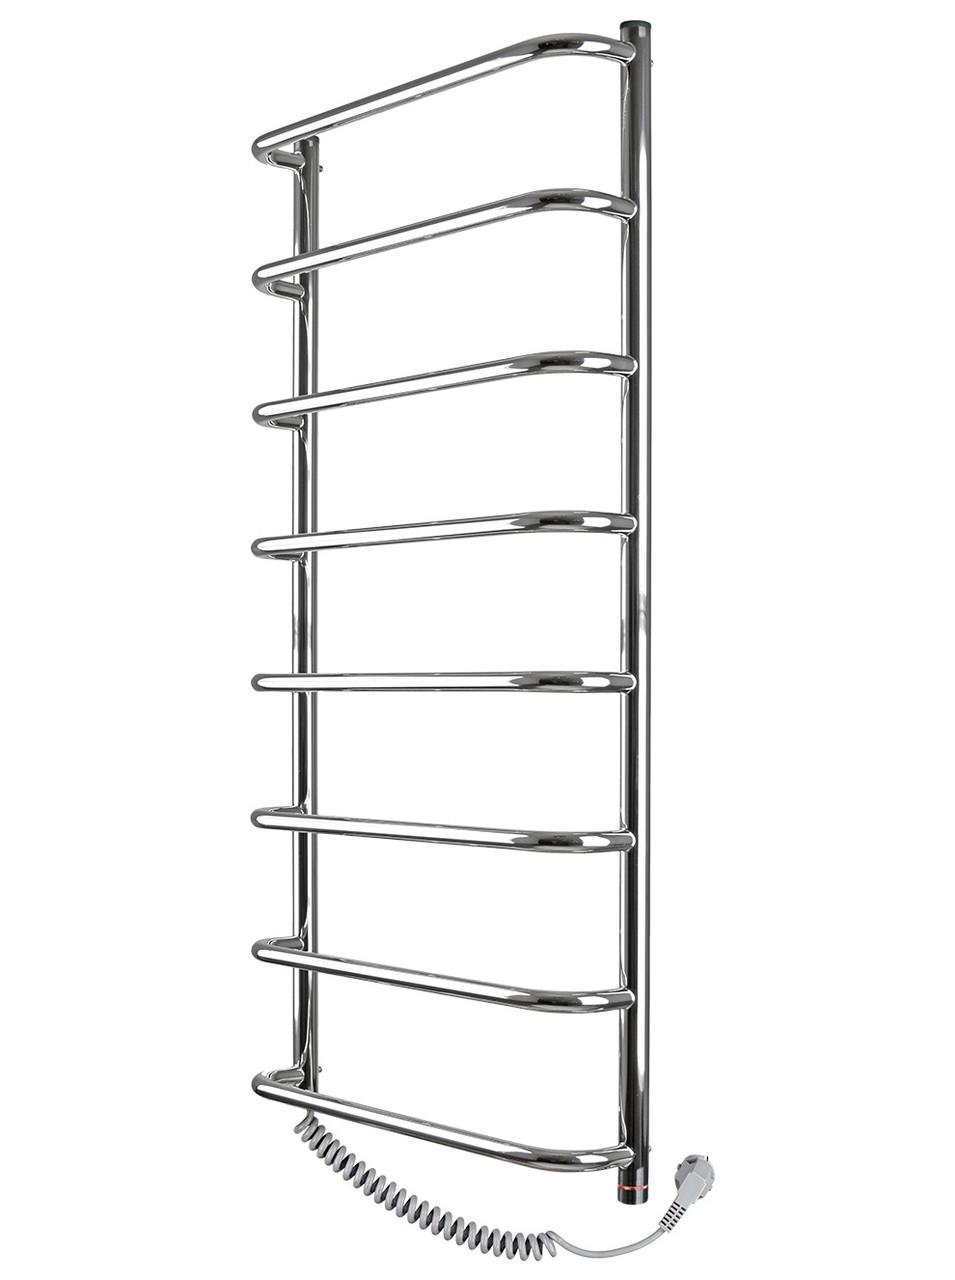 Полотенцесушитель электрический Mario Heat Point-I Стандарт 1090 x 530 /150